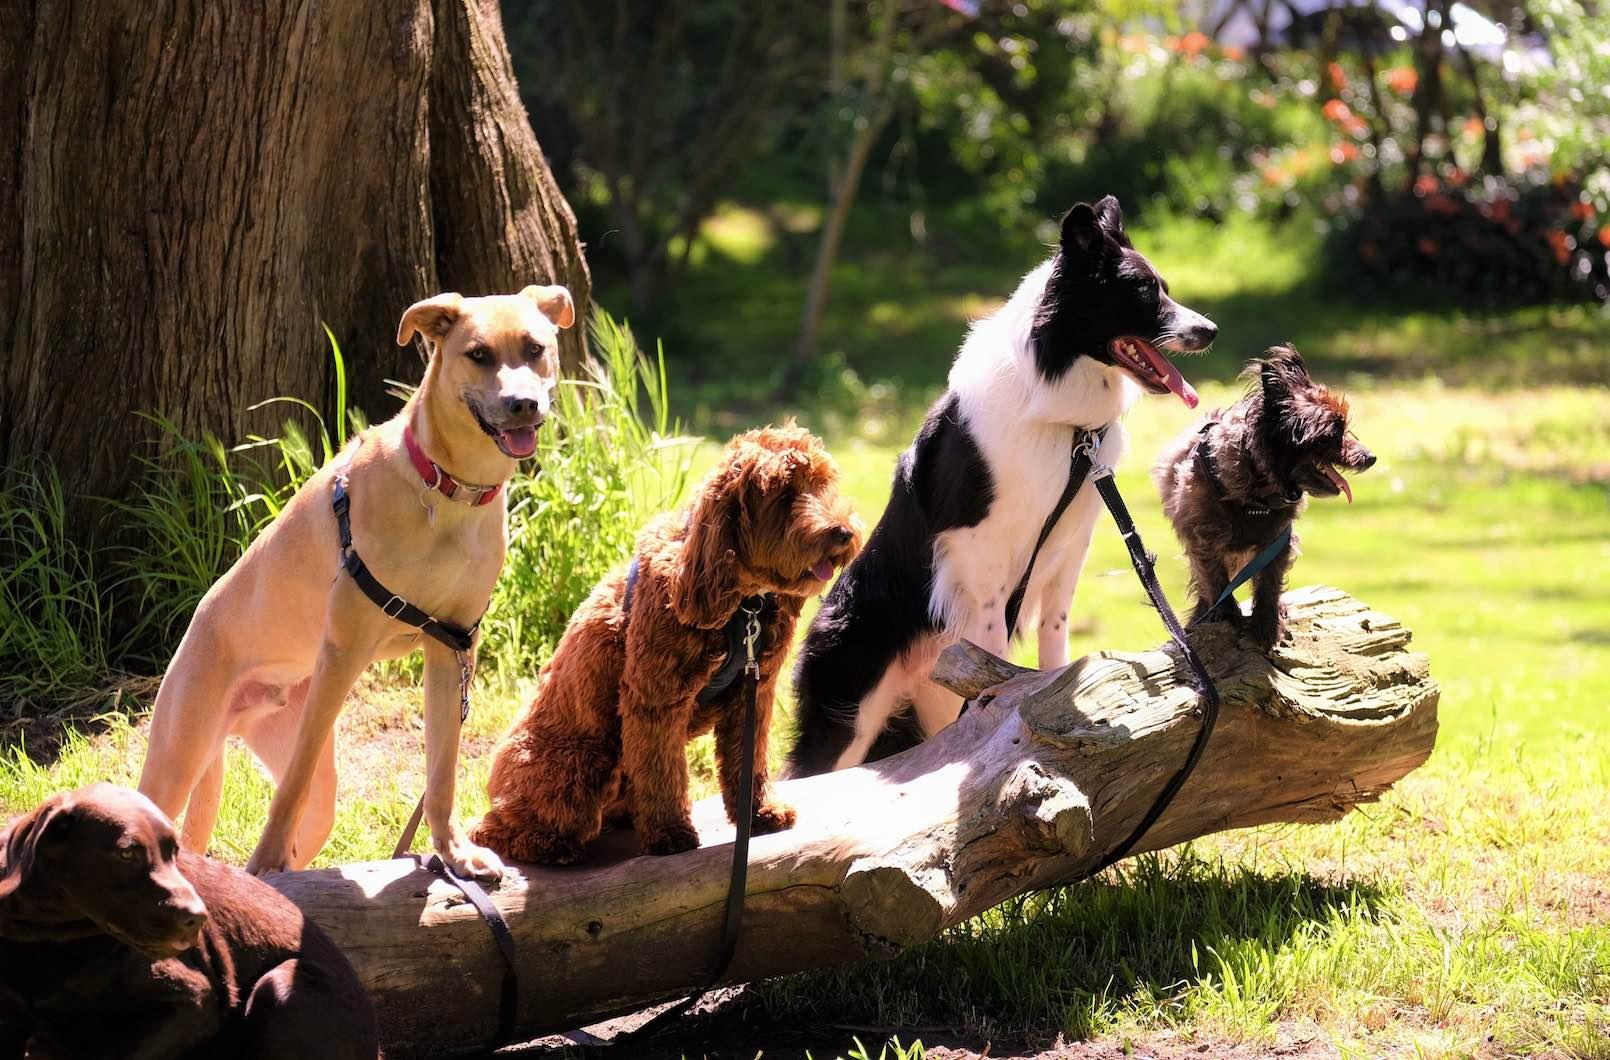 https://www.ccspca.com/blog-spca/education/poisonous-plants-for-dogs/